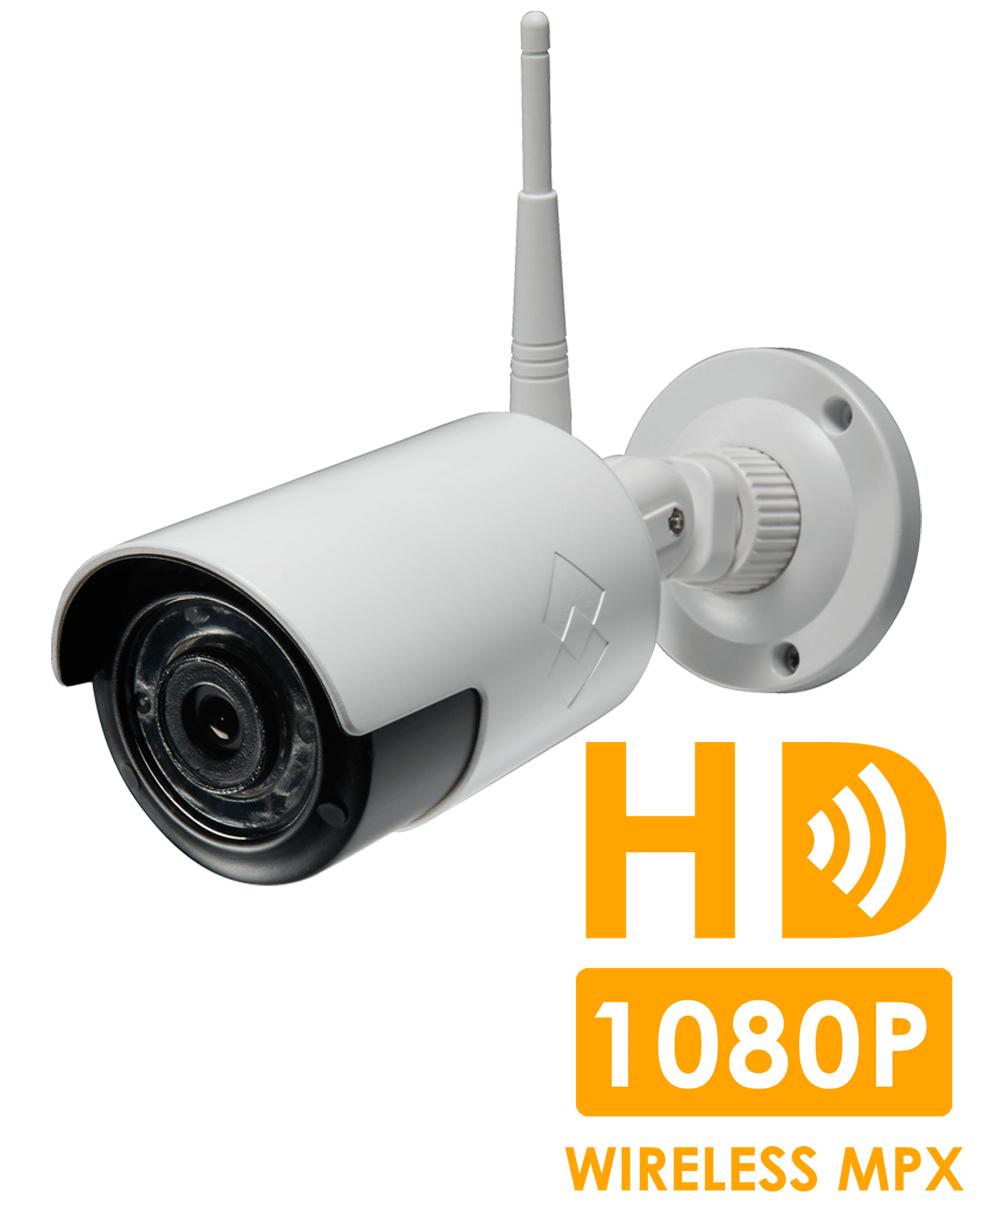 1080p HD wireless video